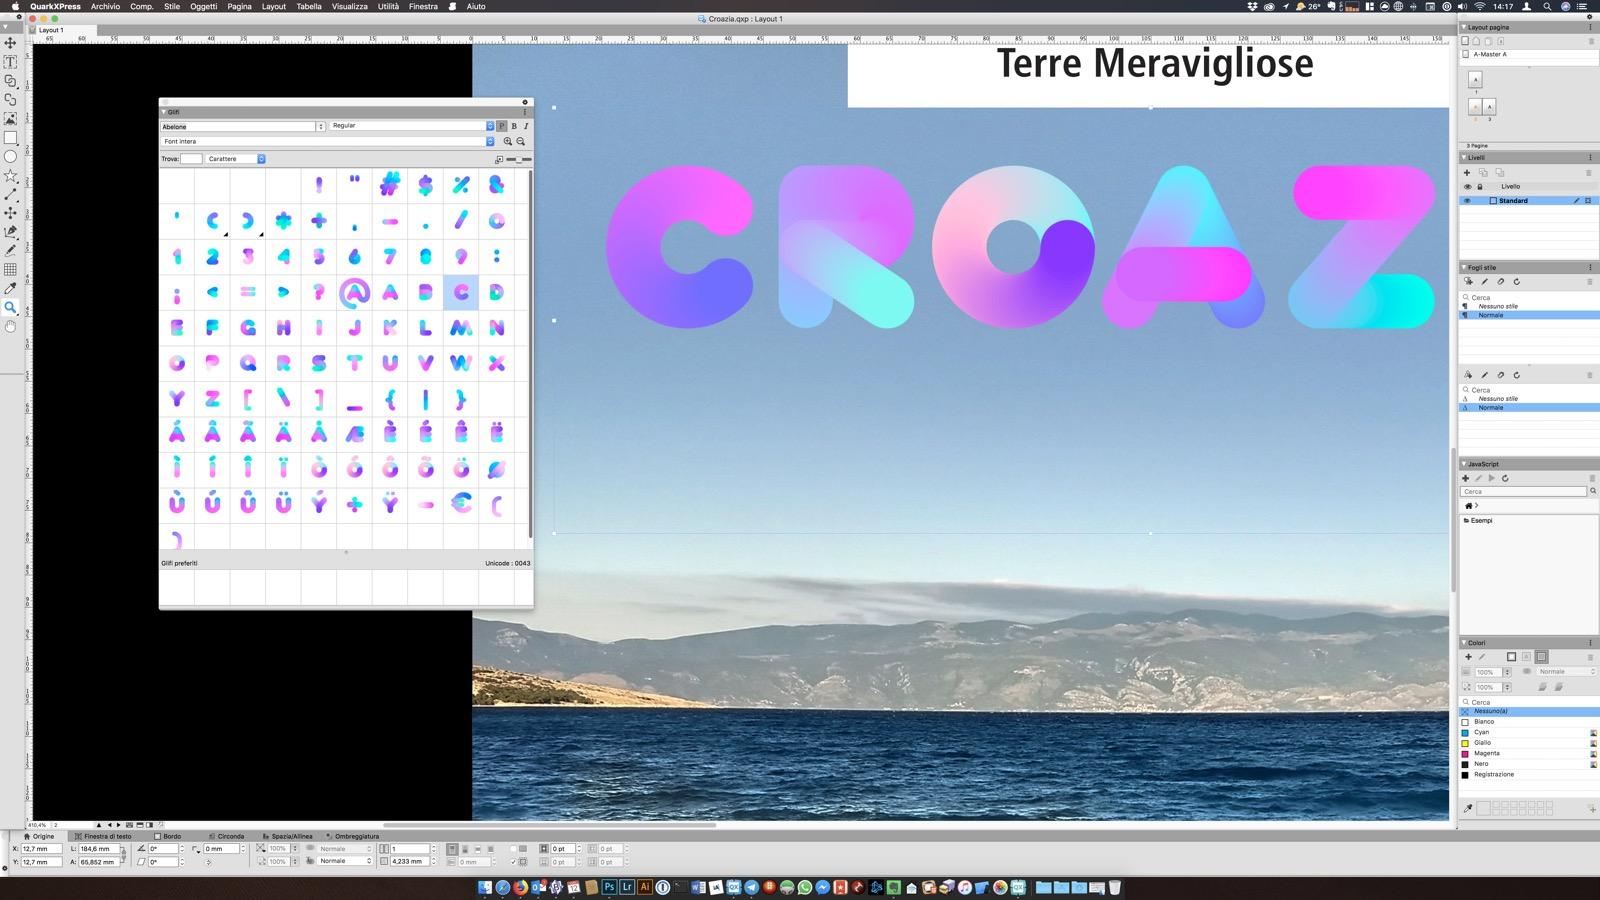 mac os free download full version iso